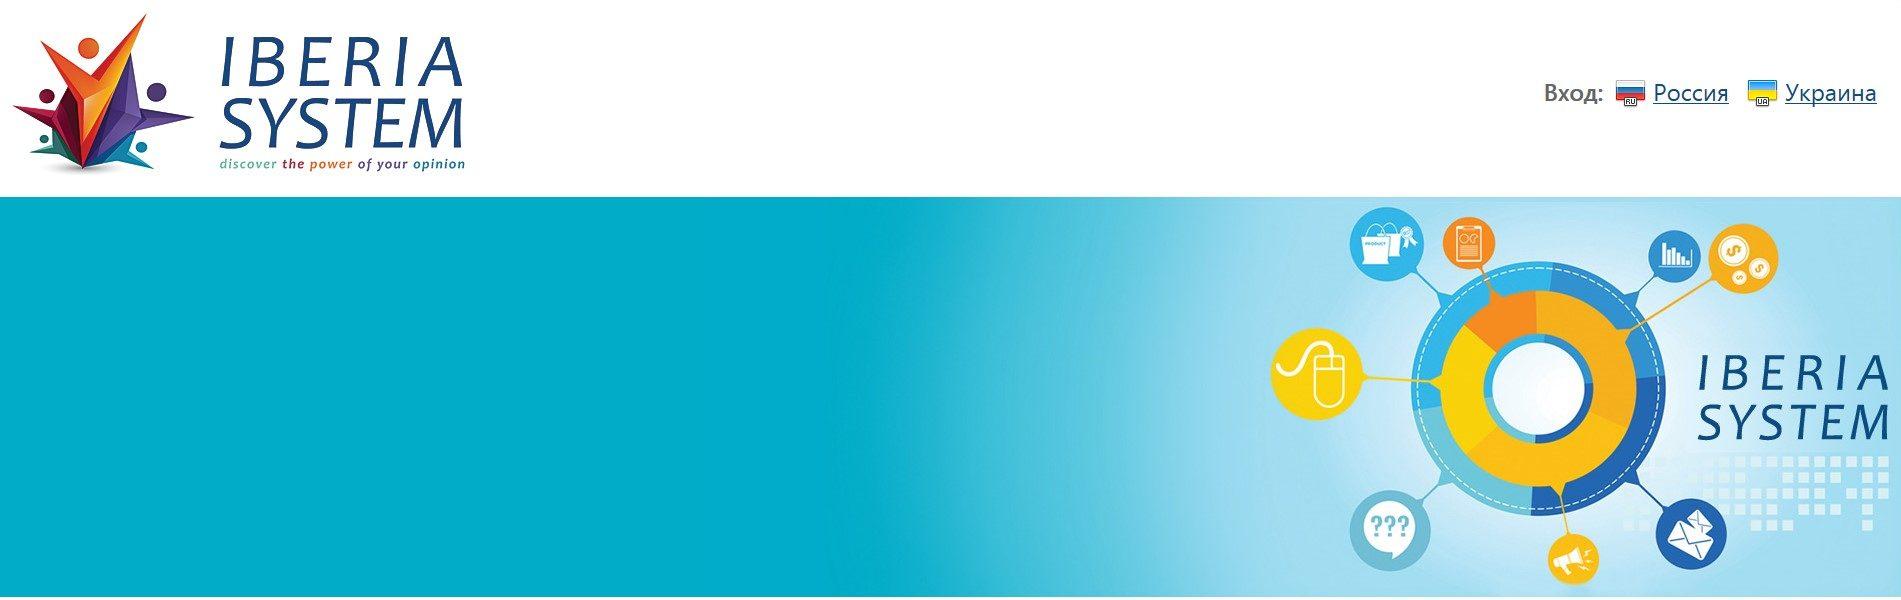 IBERIA SISTEM опросы онлайн, отзывы о проекте